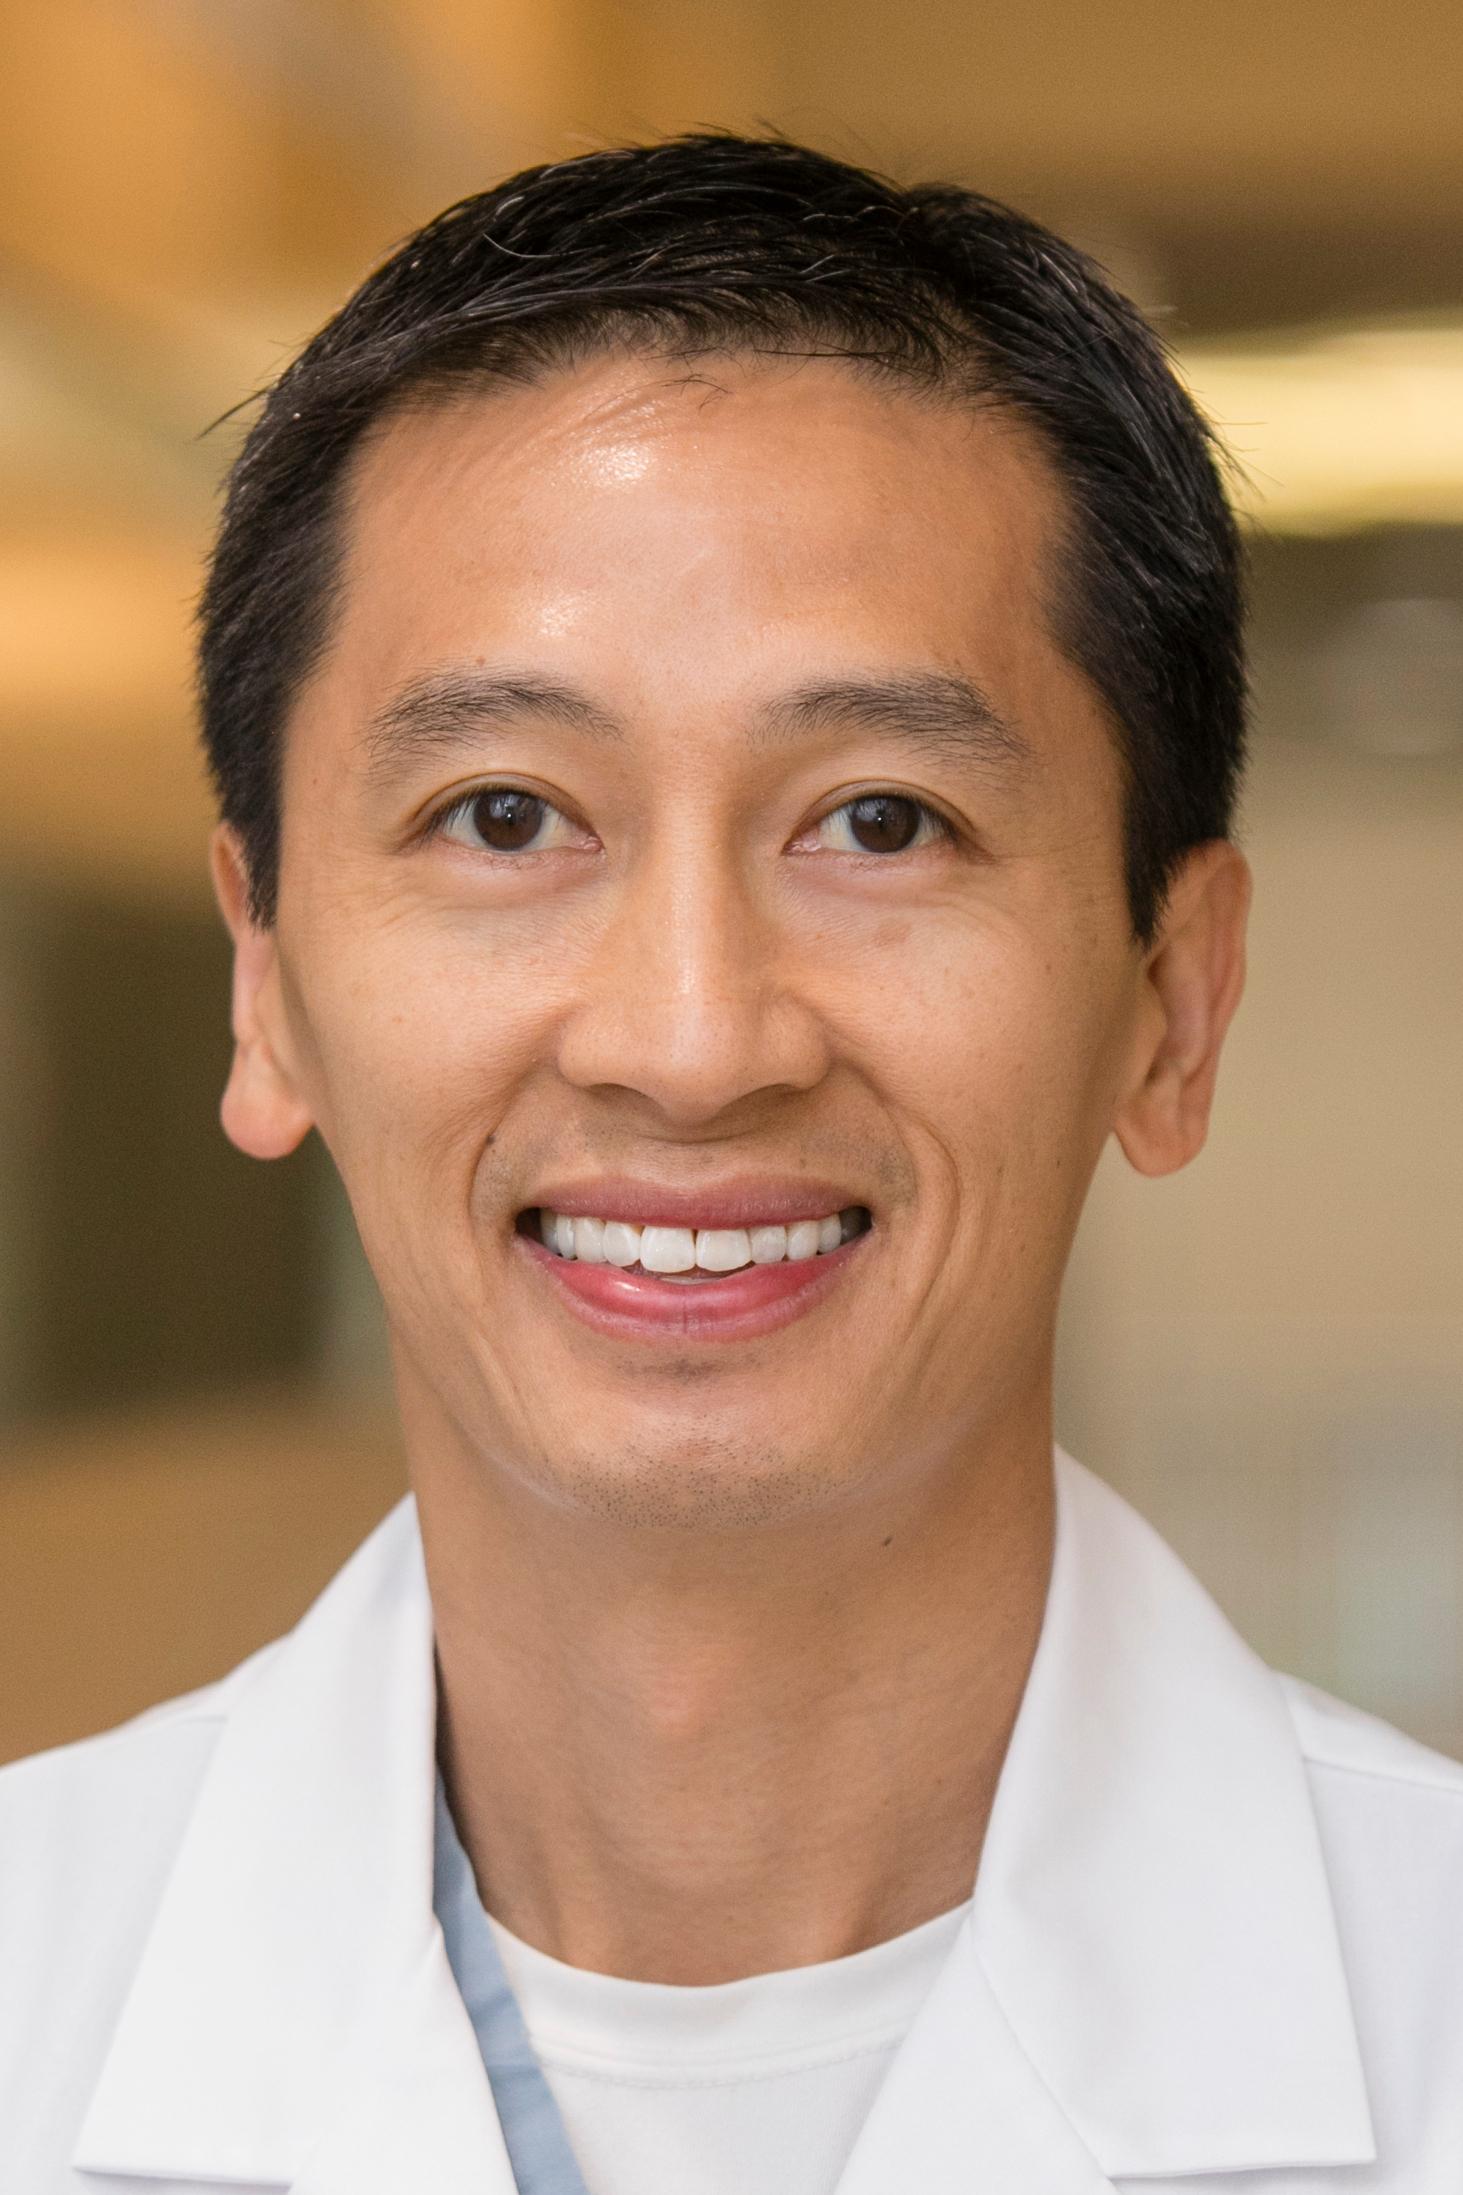 Tuan Nguyen, MD